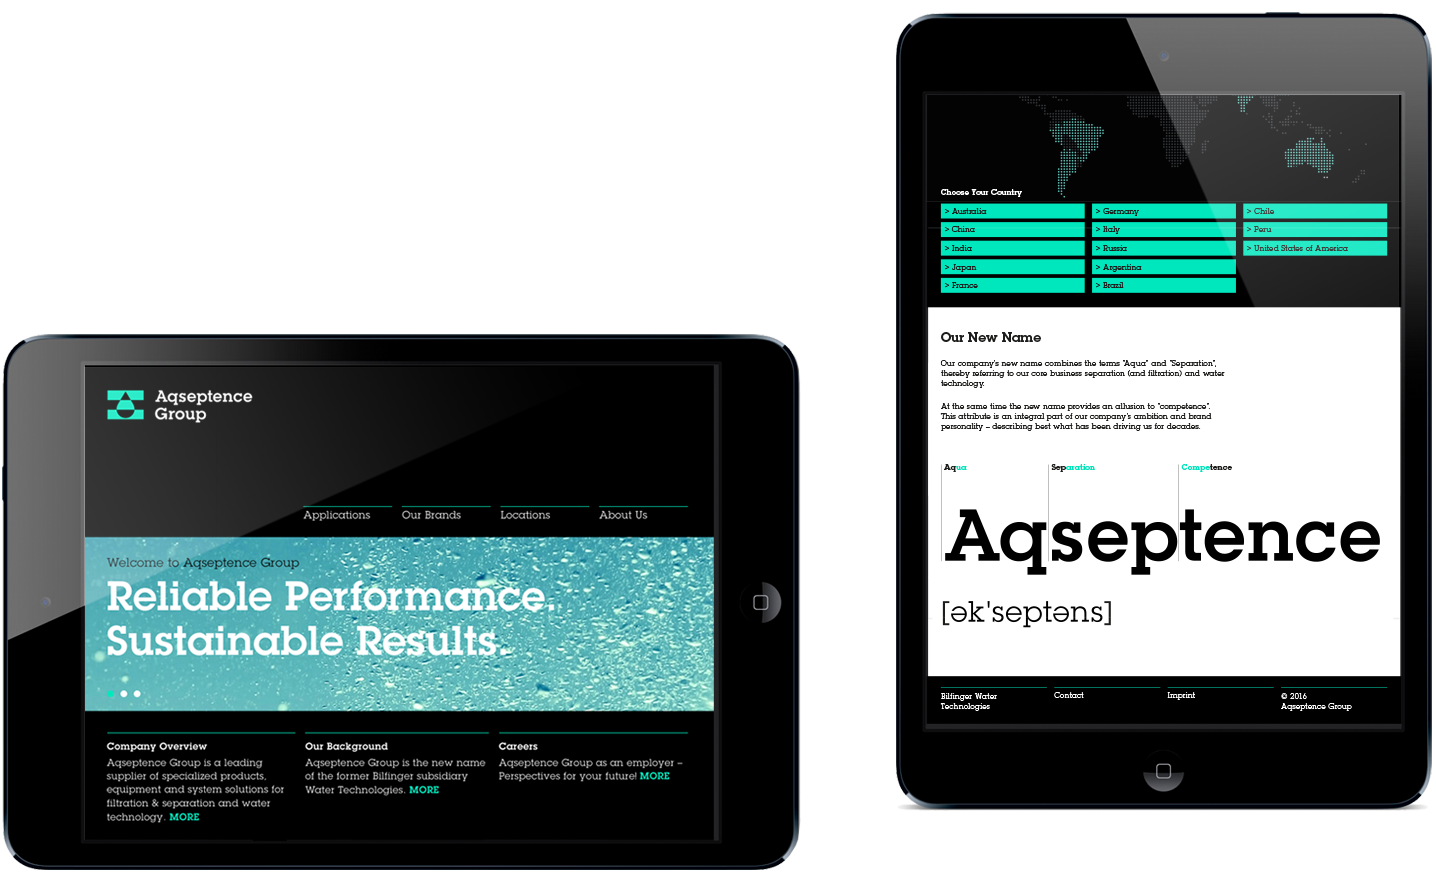 Aqseptence website on iPad